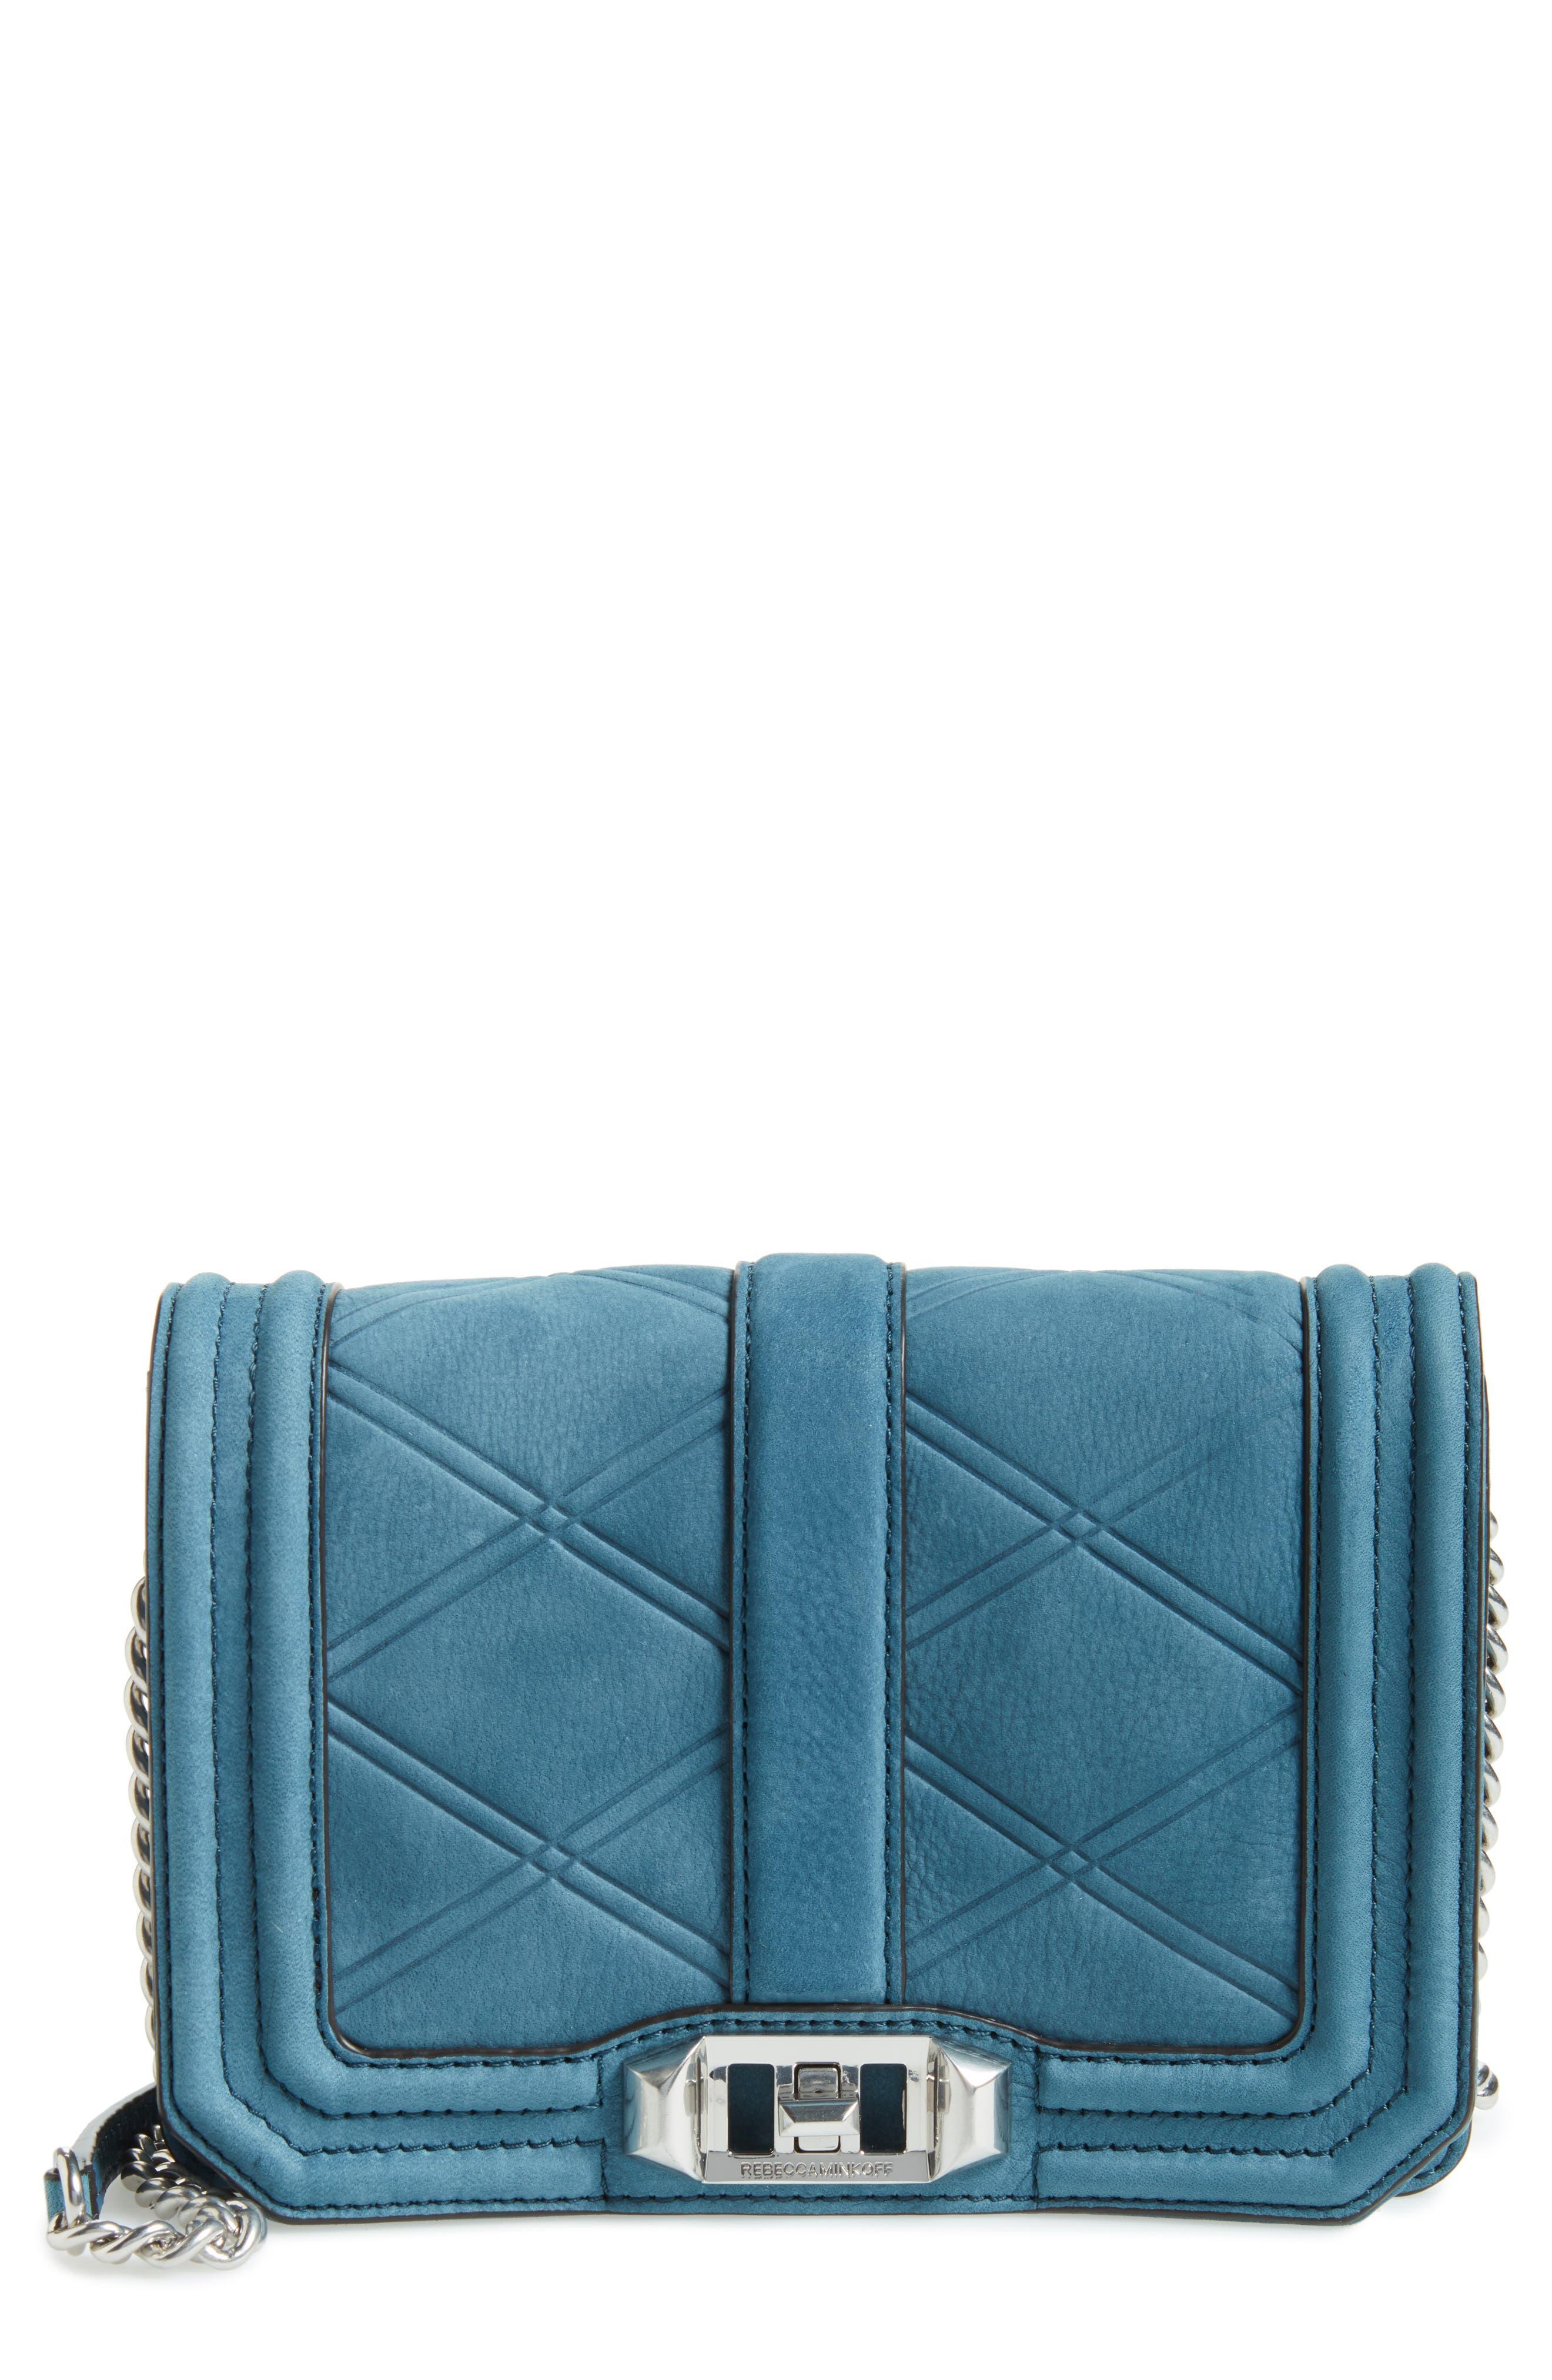 Alternate Image 1 Selected - Rebecca Minkoff Small Love Nubuck Leather Crossbody Bag